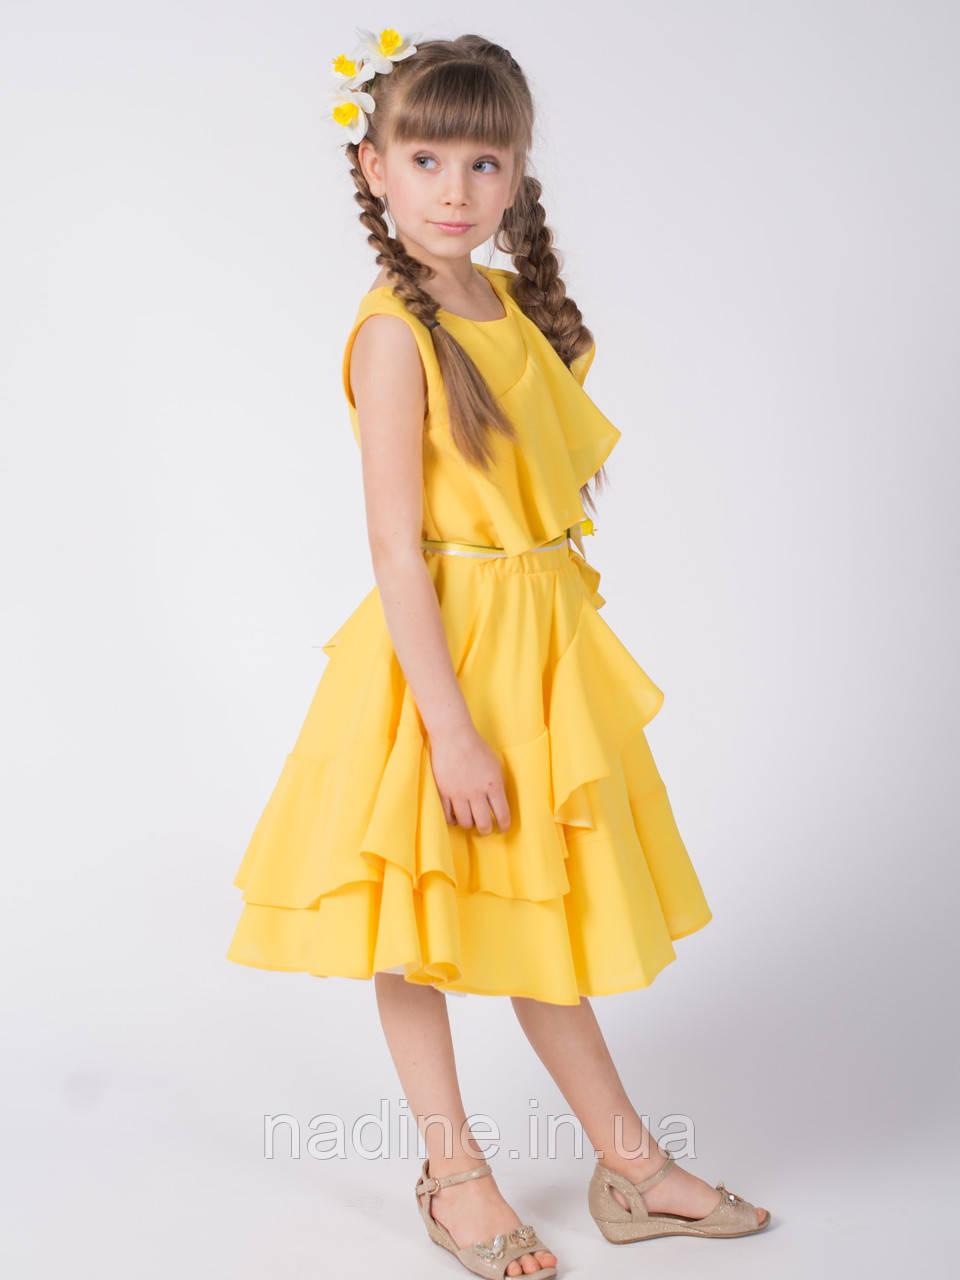 Платье Nadine на девочку, Yellow Narcissus рост 128. Жёлтое